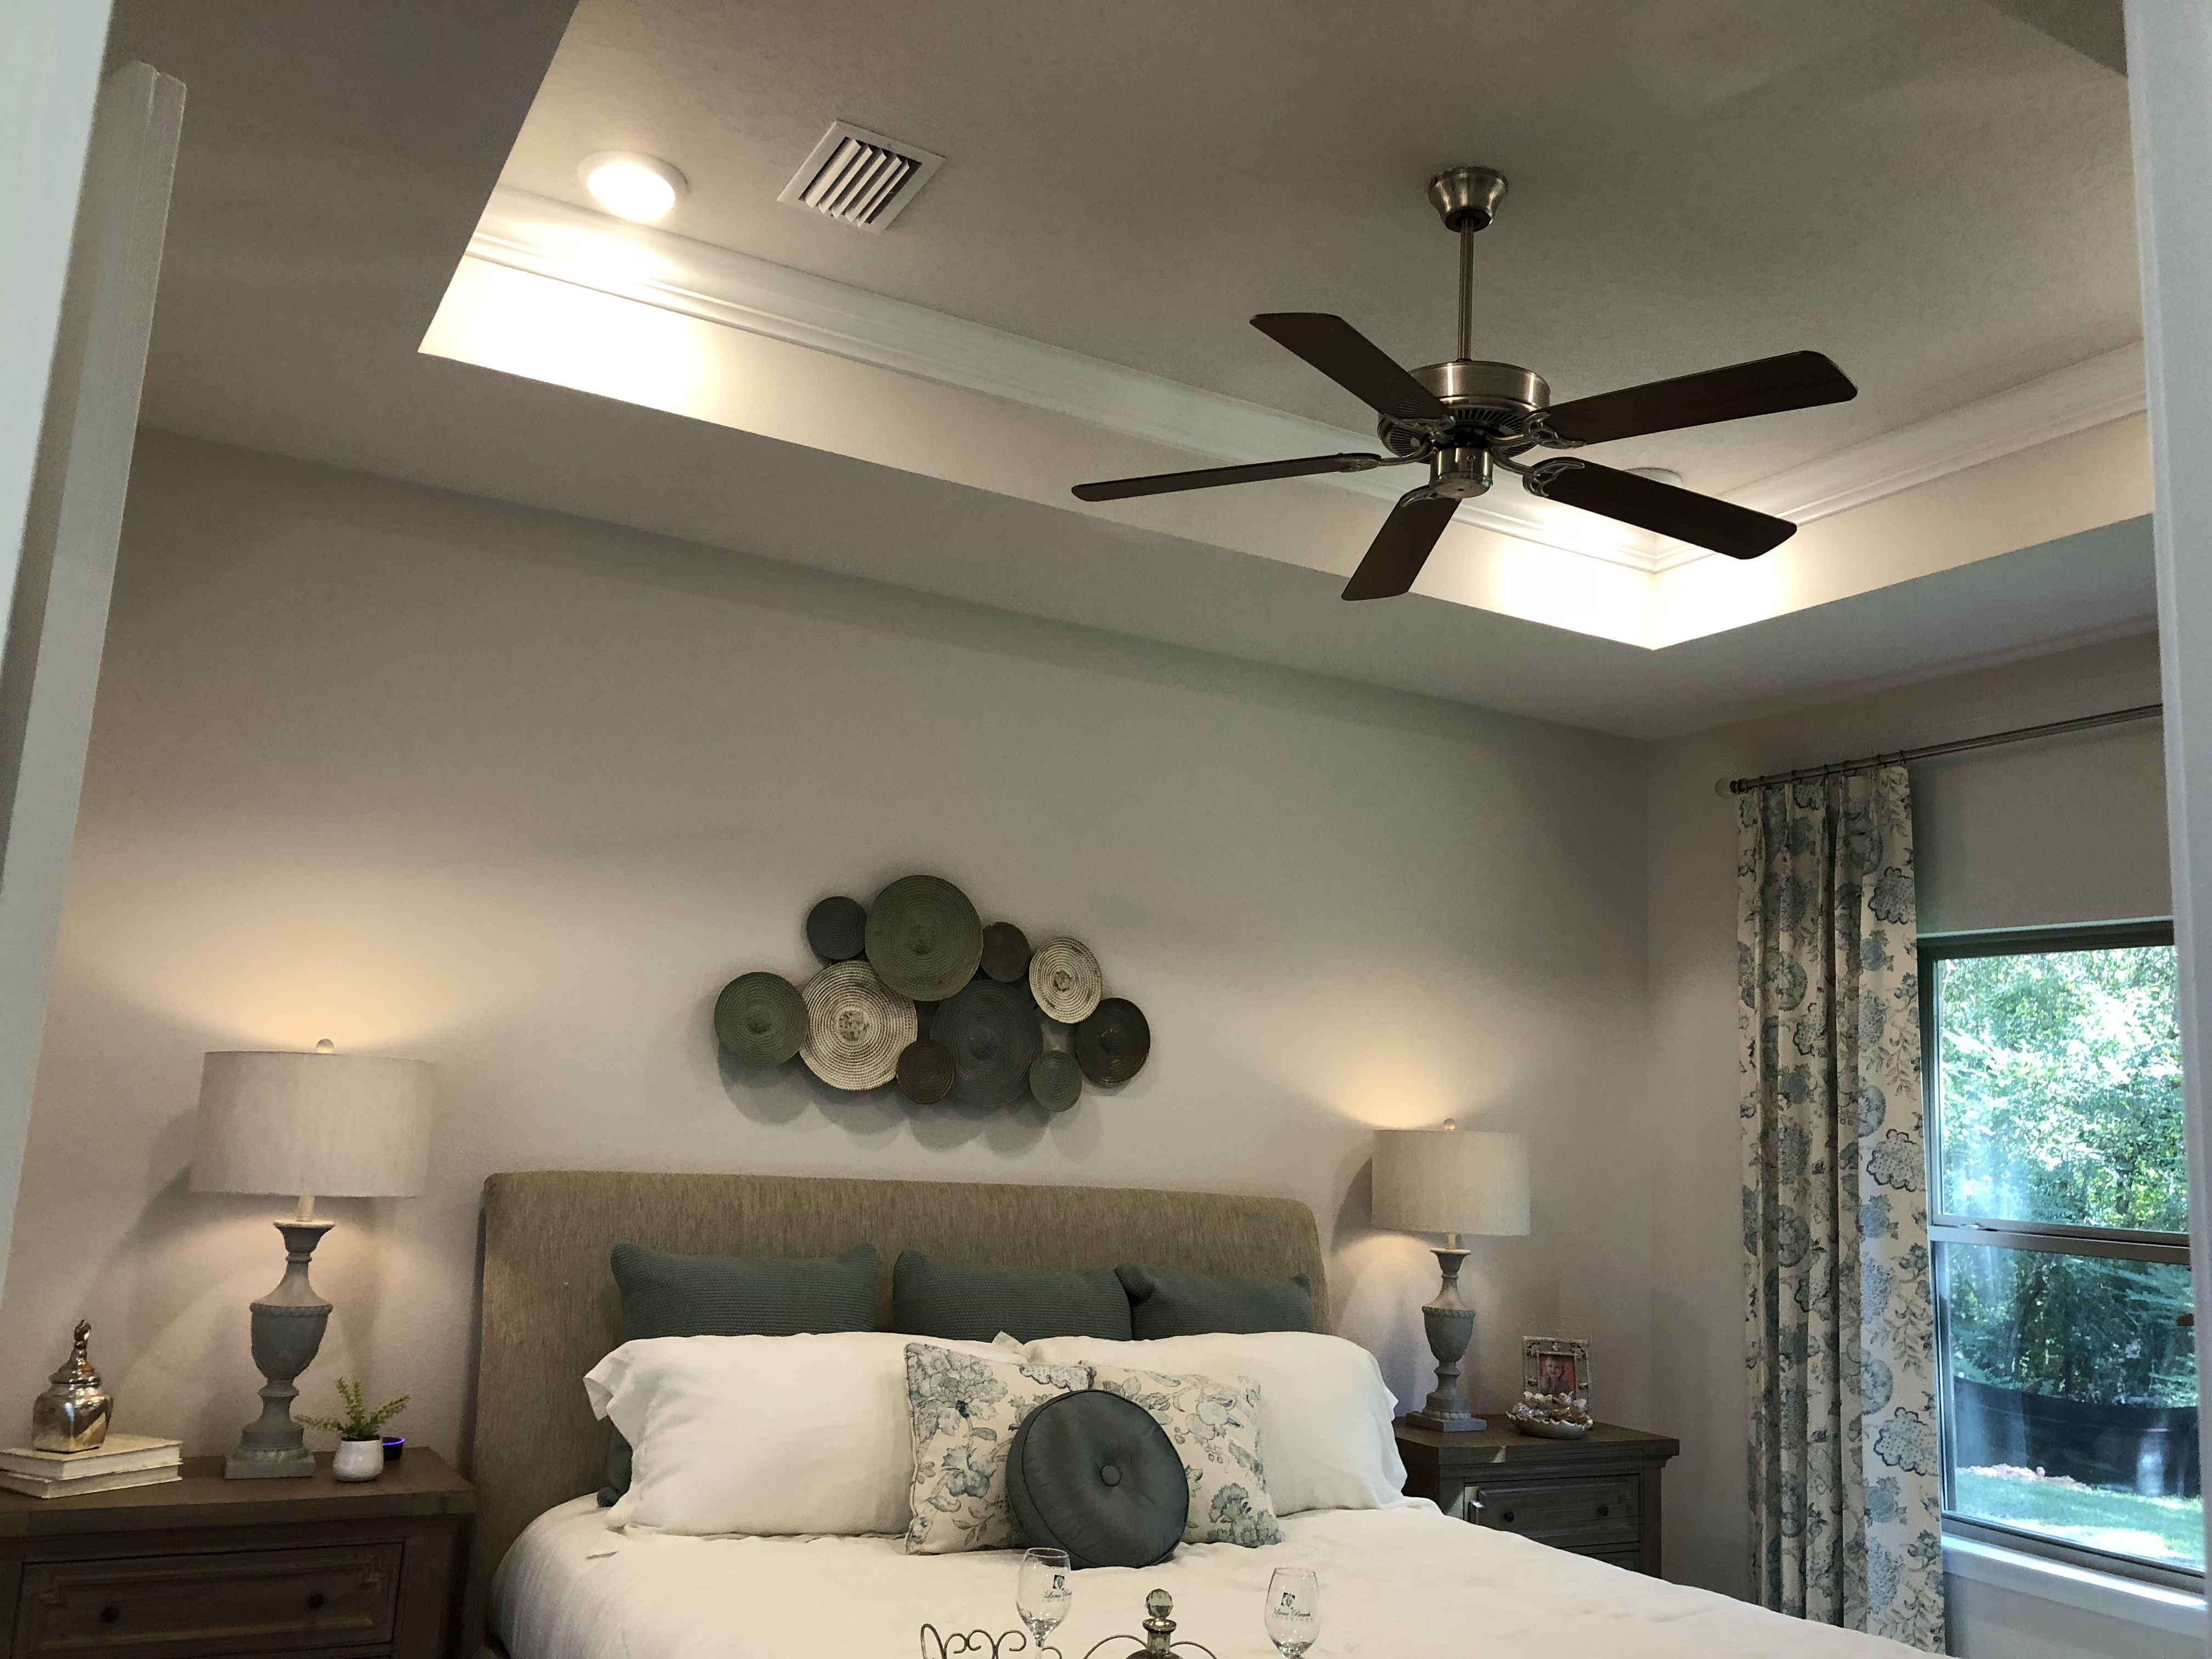 Dr Horton Model Home Florida Loft Style Bedroom Master Bedroom Interior Bedroom Layouts